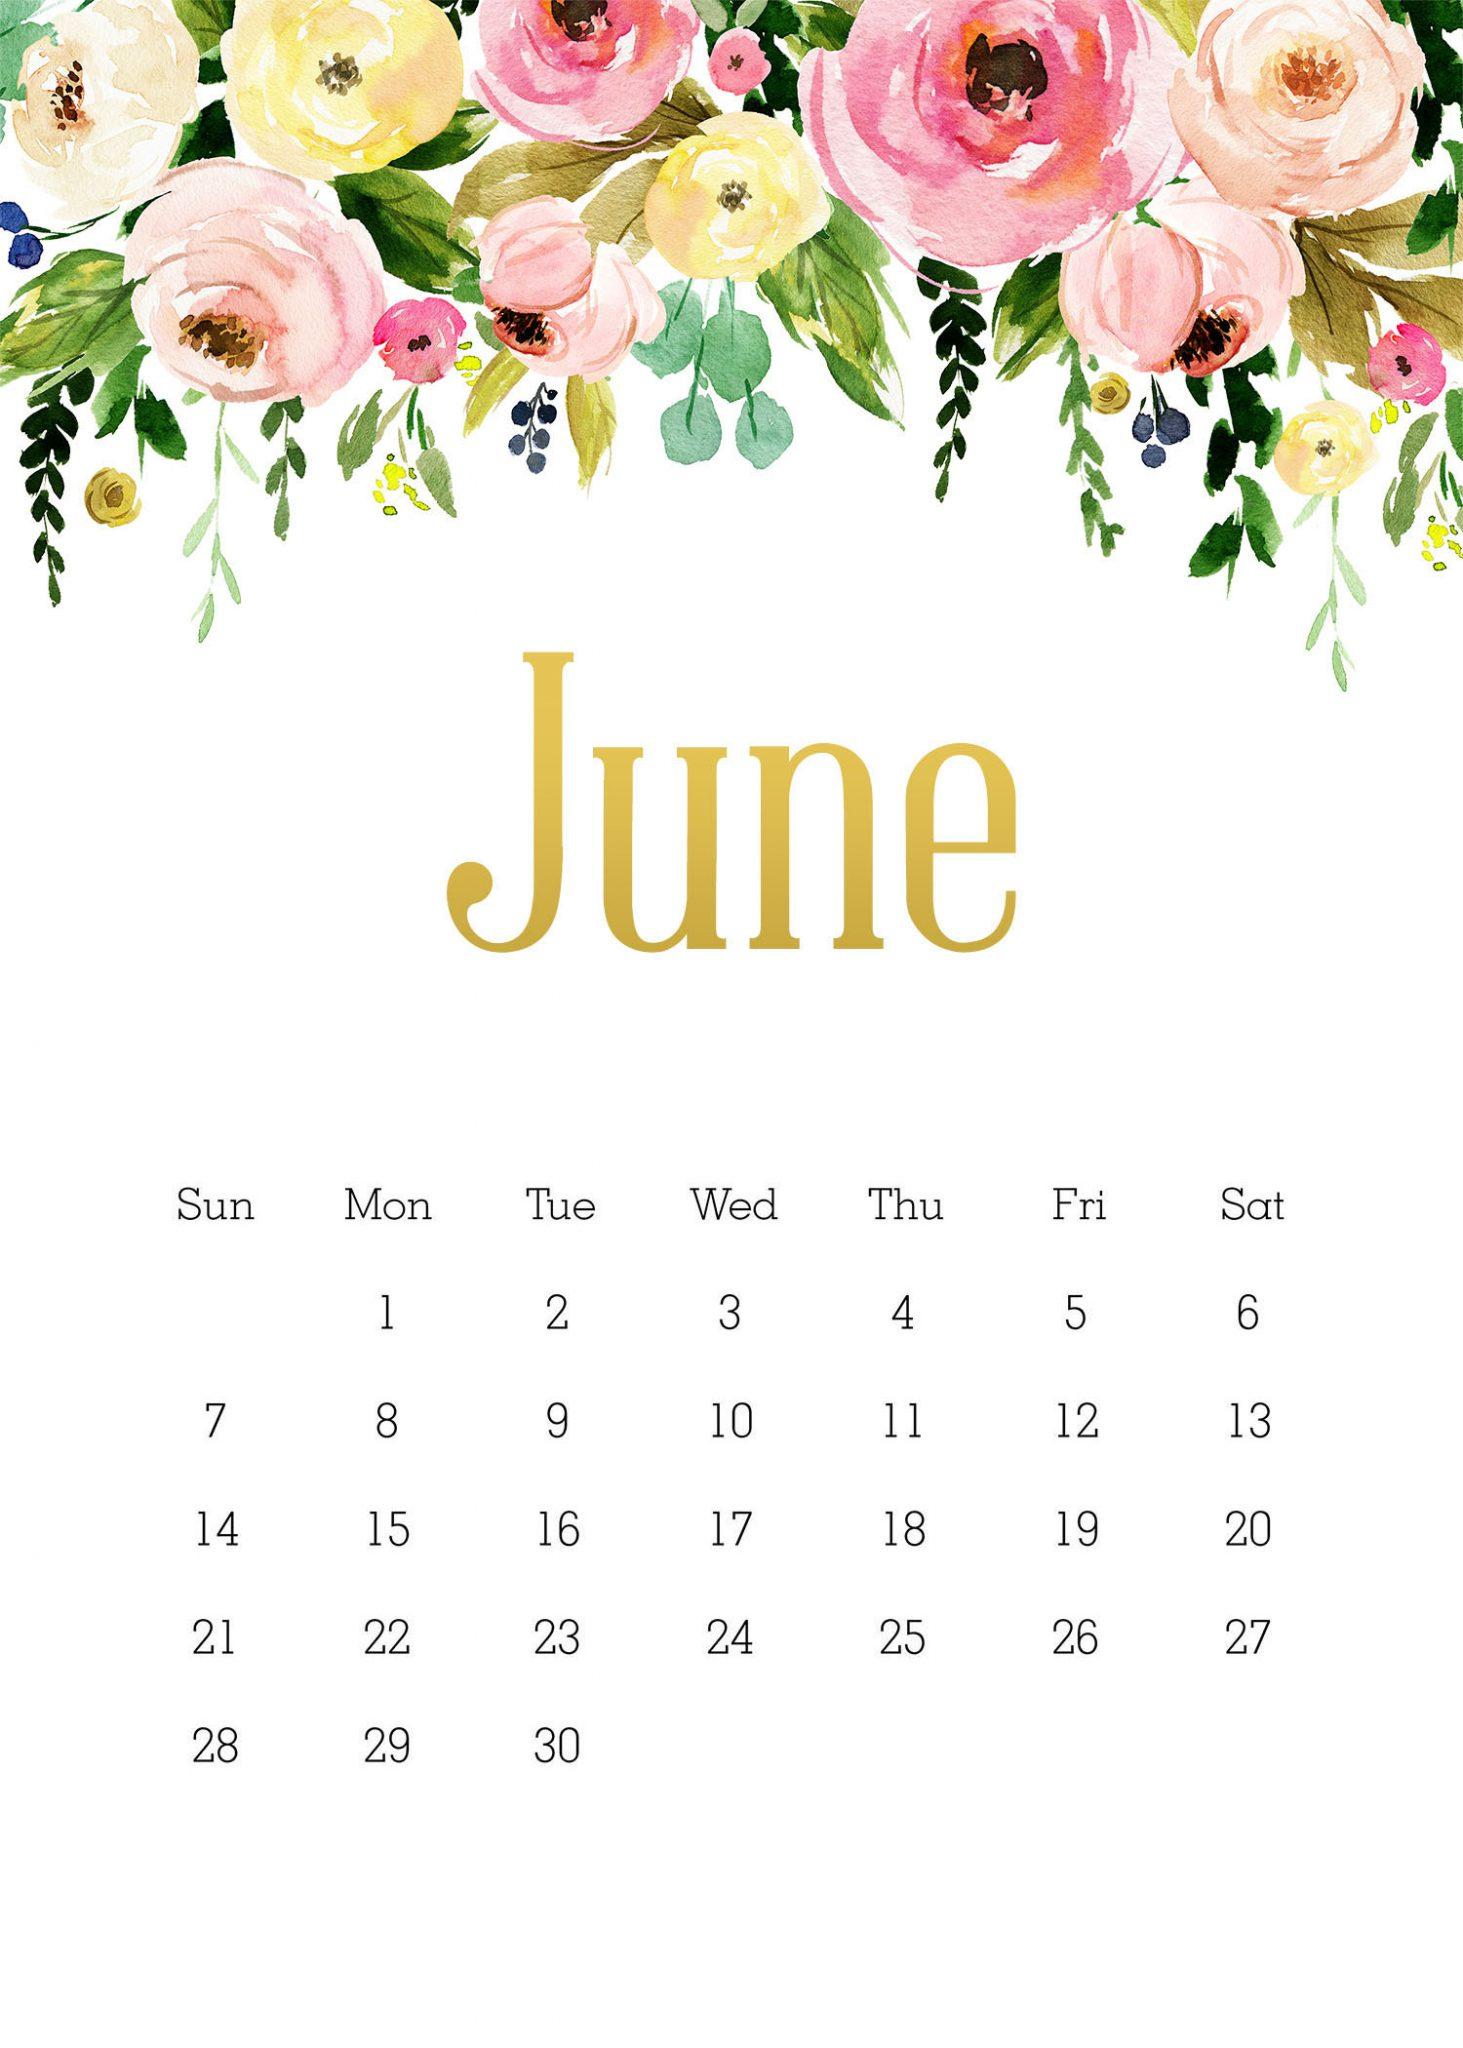 Cute June 2020 iPhone Calendar Wallpaper